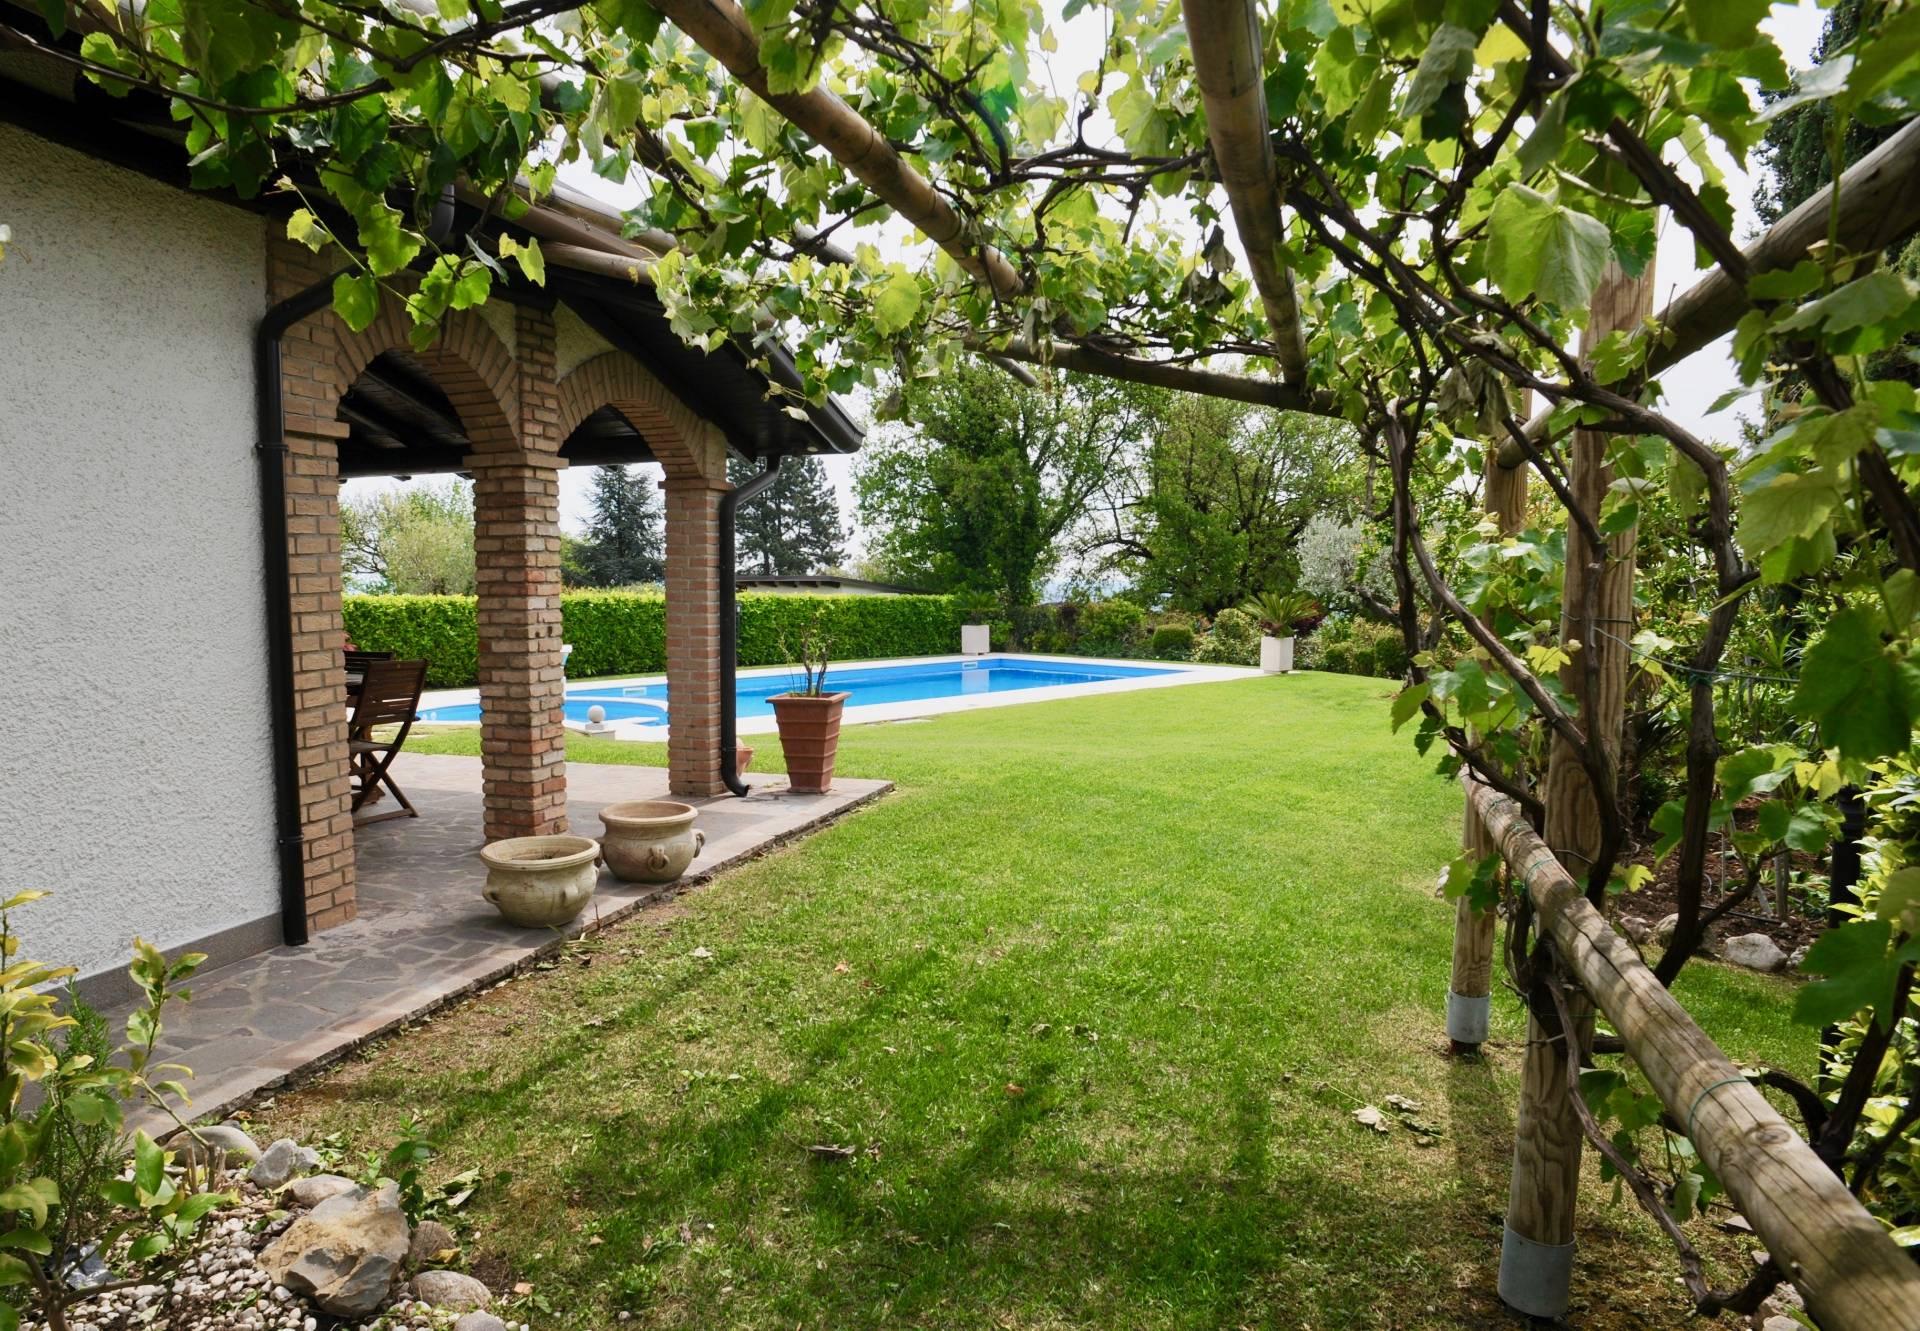 Villa in Vendita a Padenghe Sul Garda: 3 locali, 100 mq - Foto 14